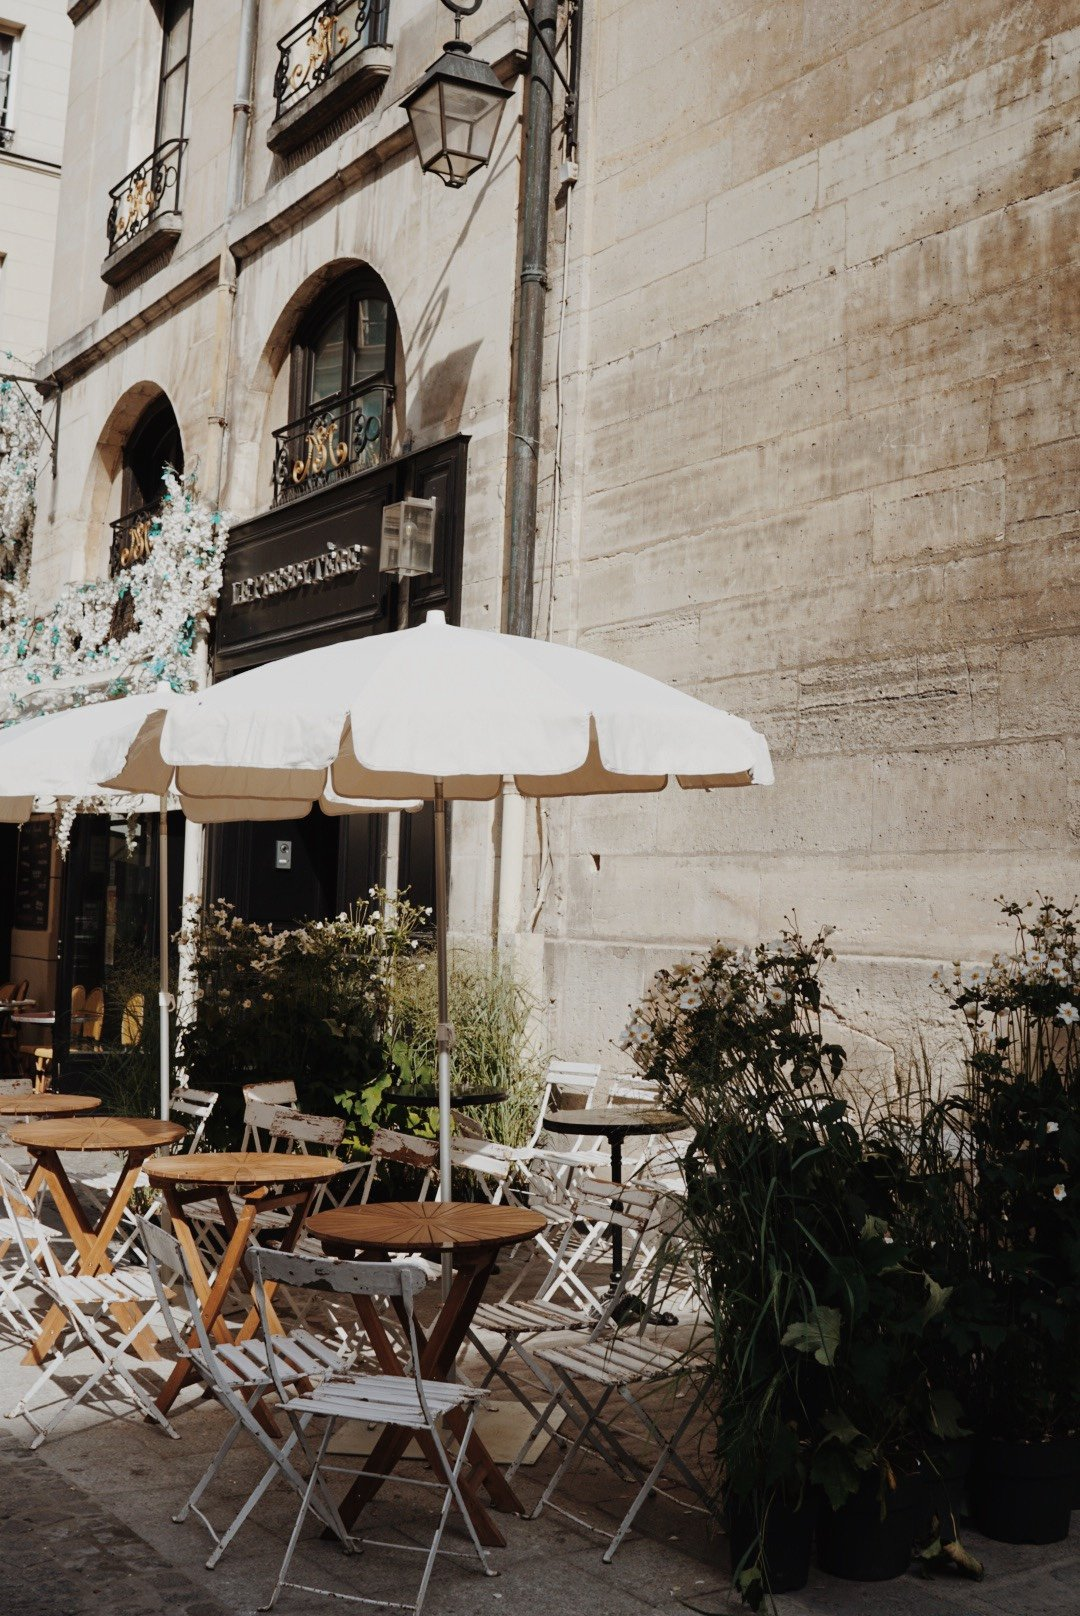 Restaurant in Le Marais